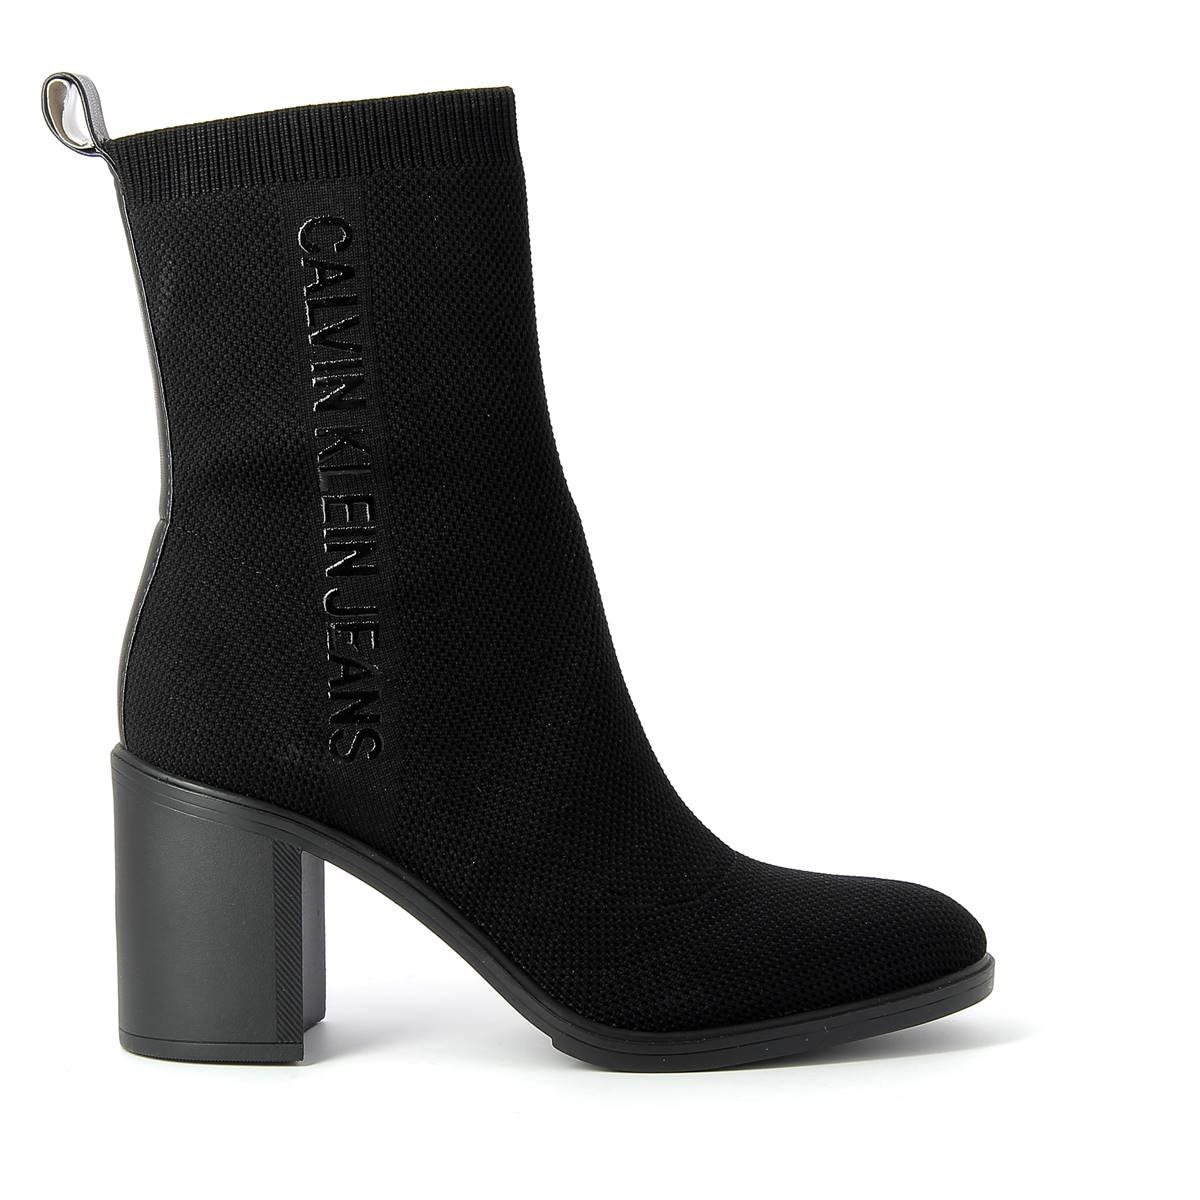 Bottine Femme Calvin Klein Block Heel